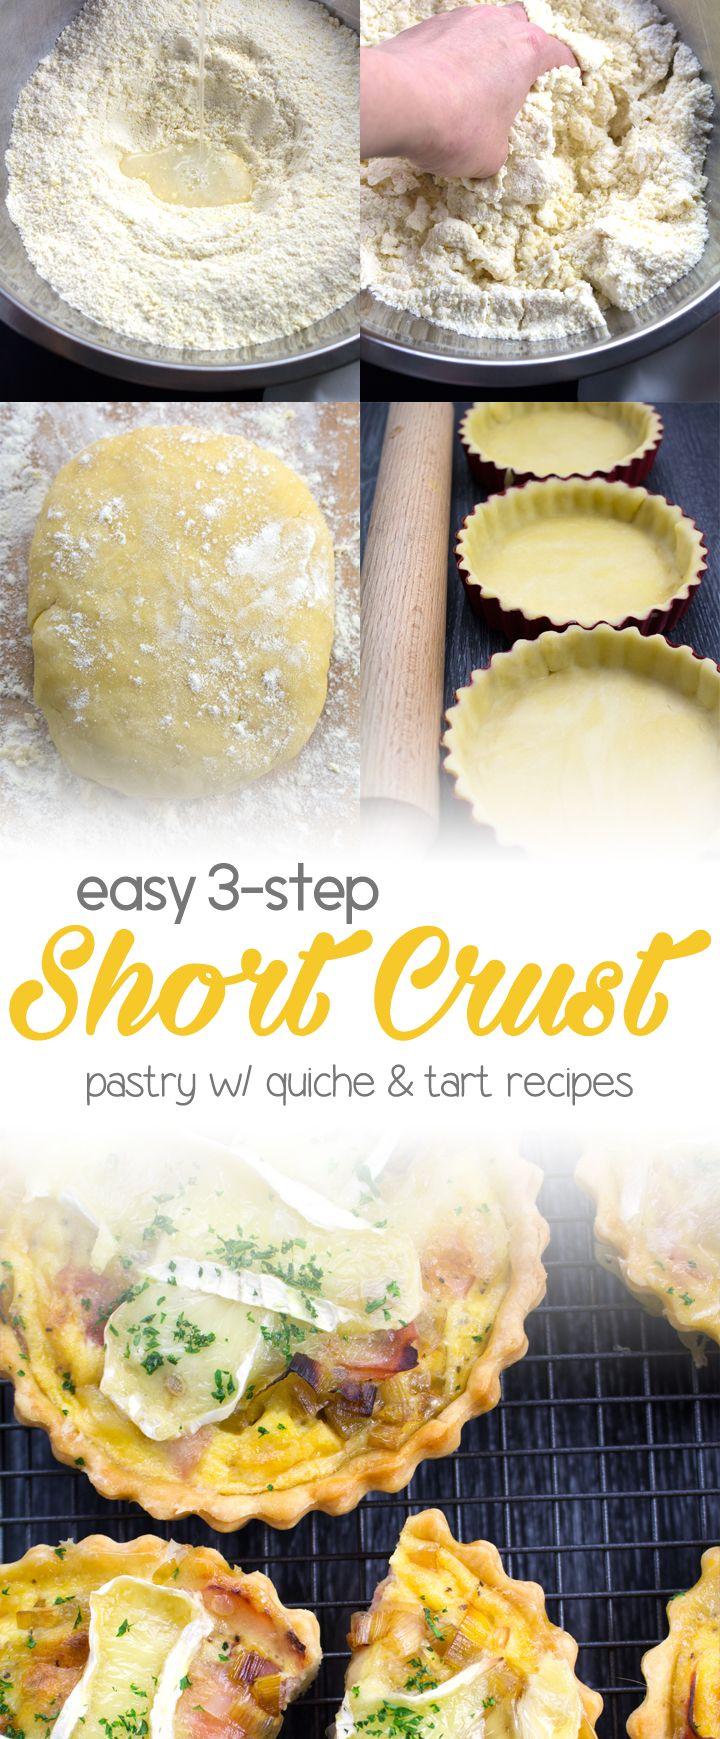 Easy 3 Step Shortcrust Pastry Recipe Food Processor Recipes Shortcrust Pastry Recipes Shortcrust Pastry